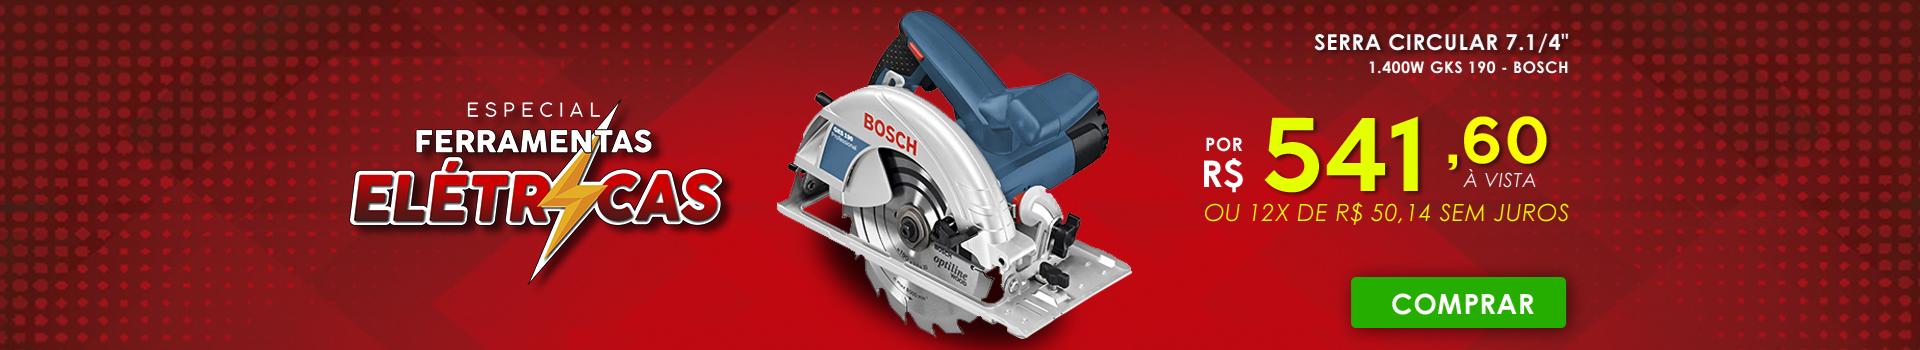 "Serra Circular 7.1/4"" GKS 190 Bosch"